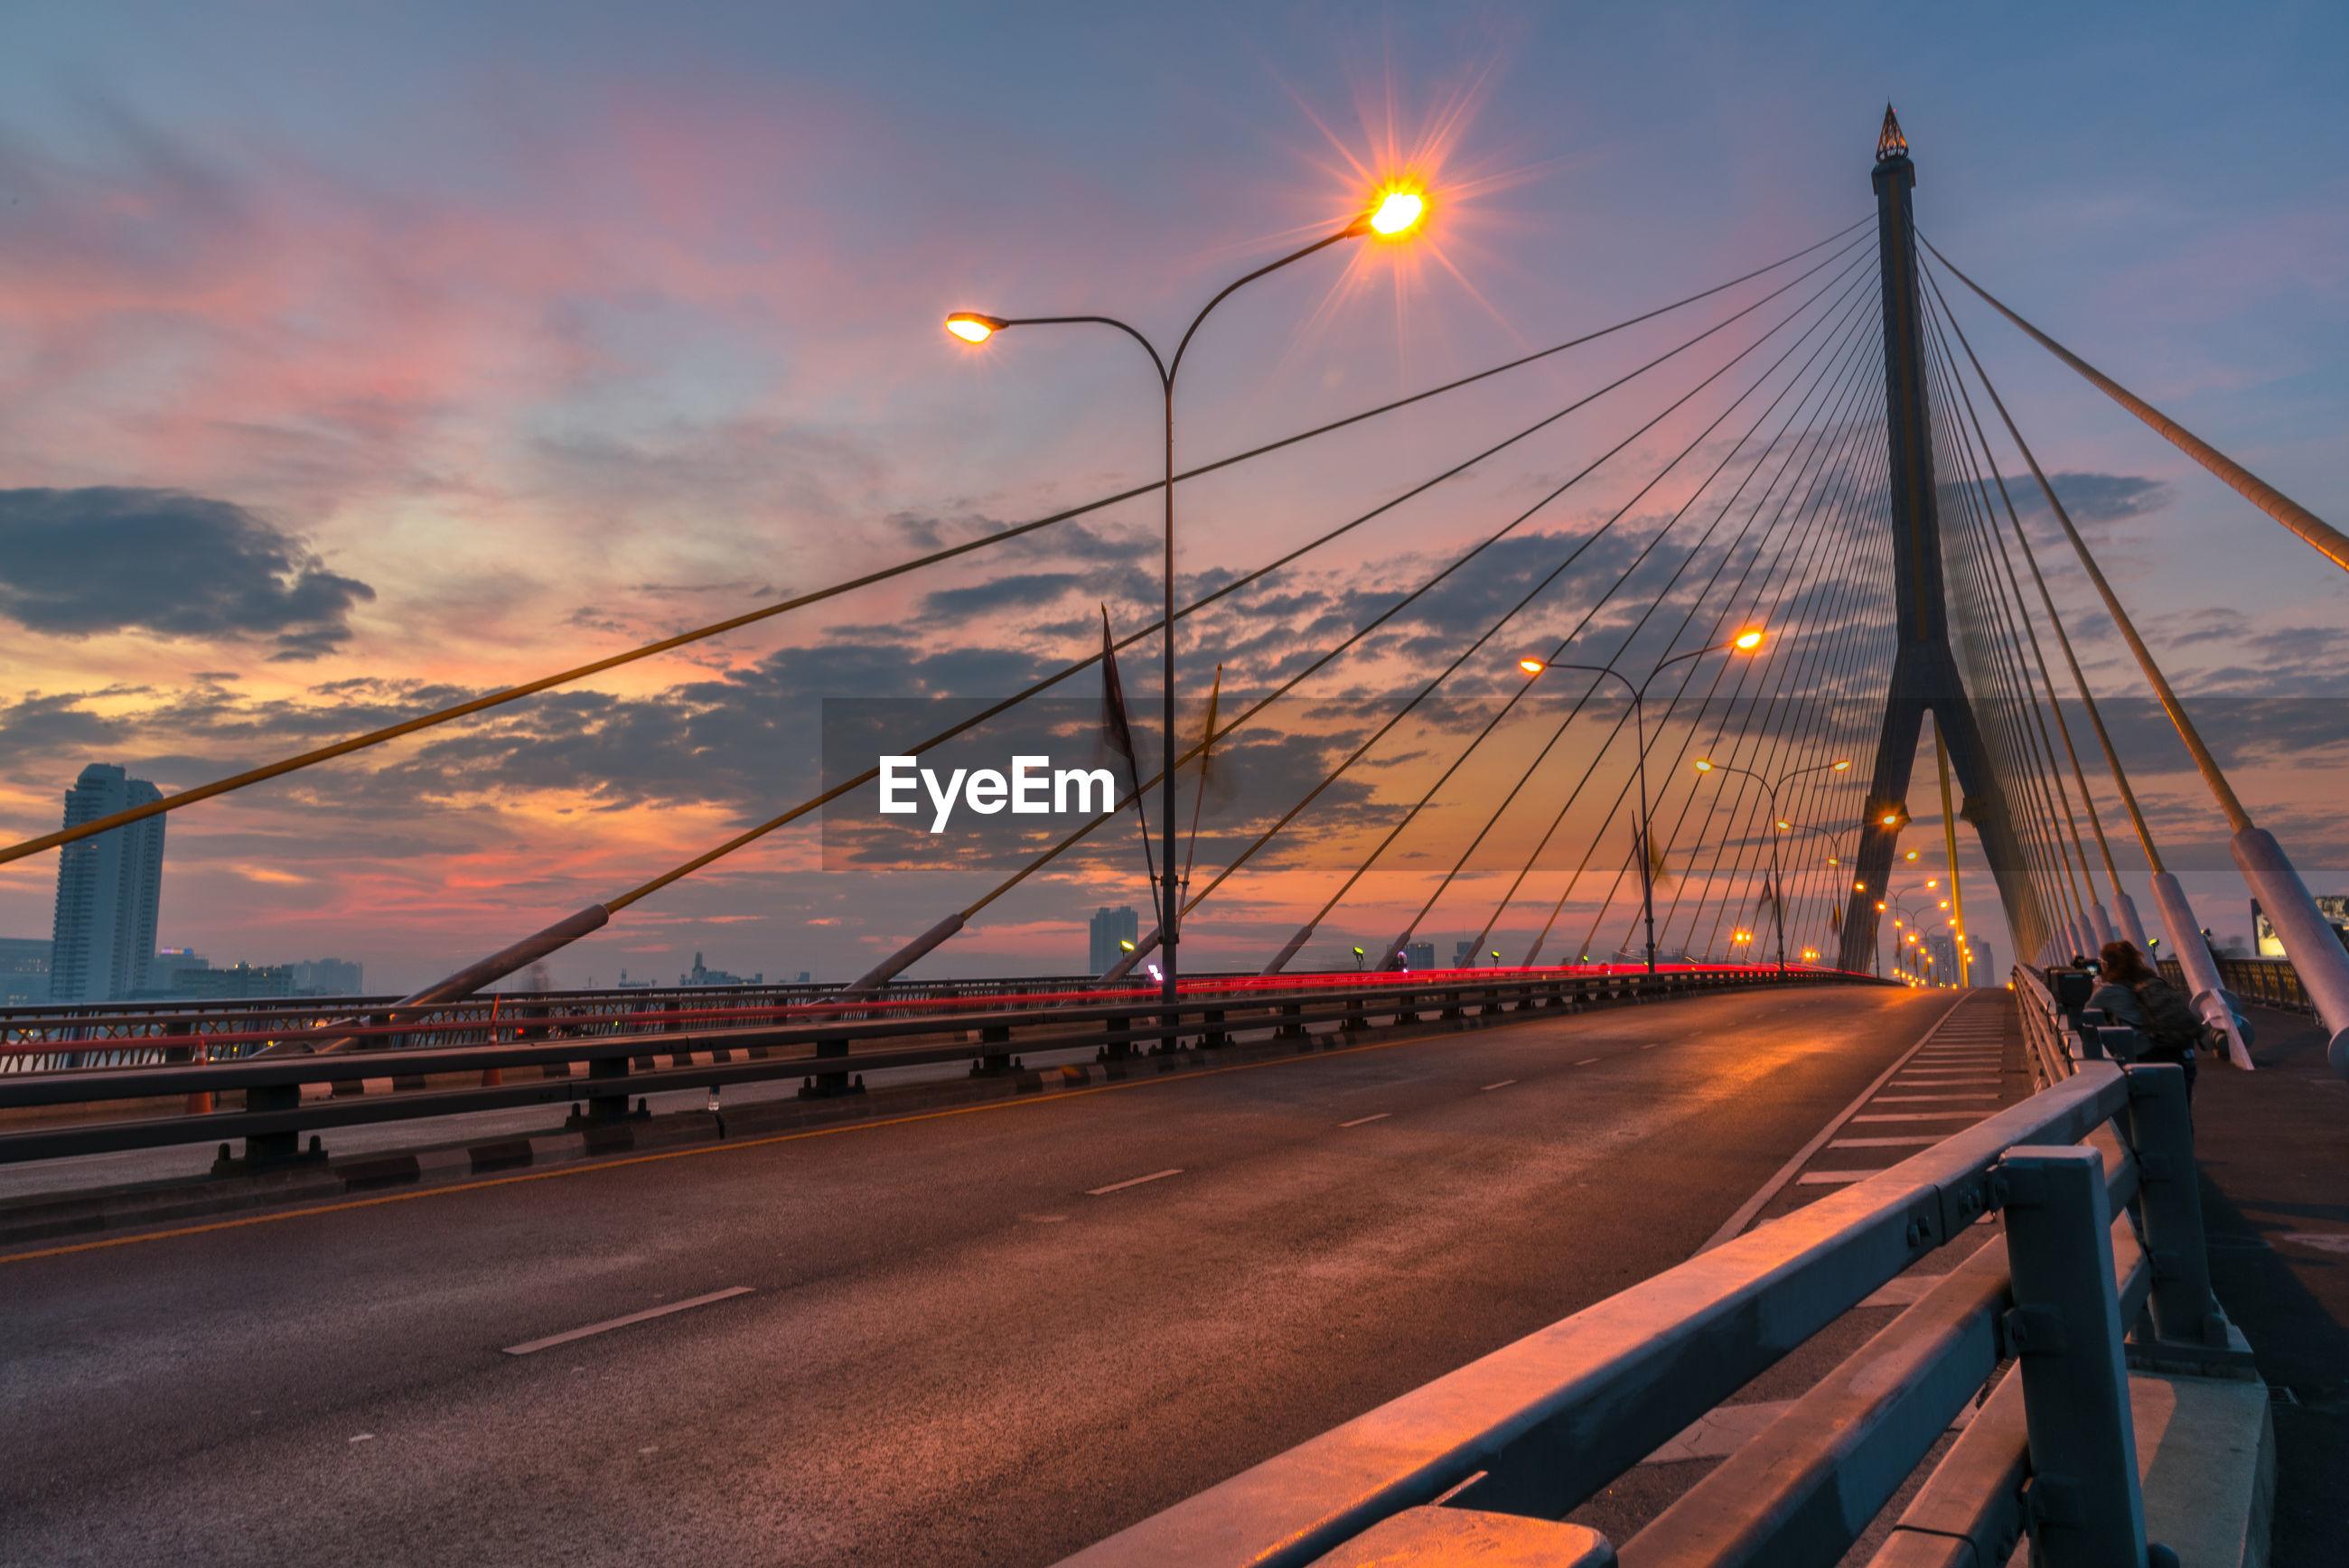 Illuminated rama viii bridge against cloudy sky at dusk in city